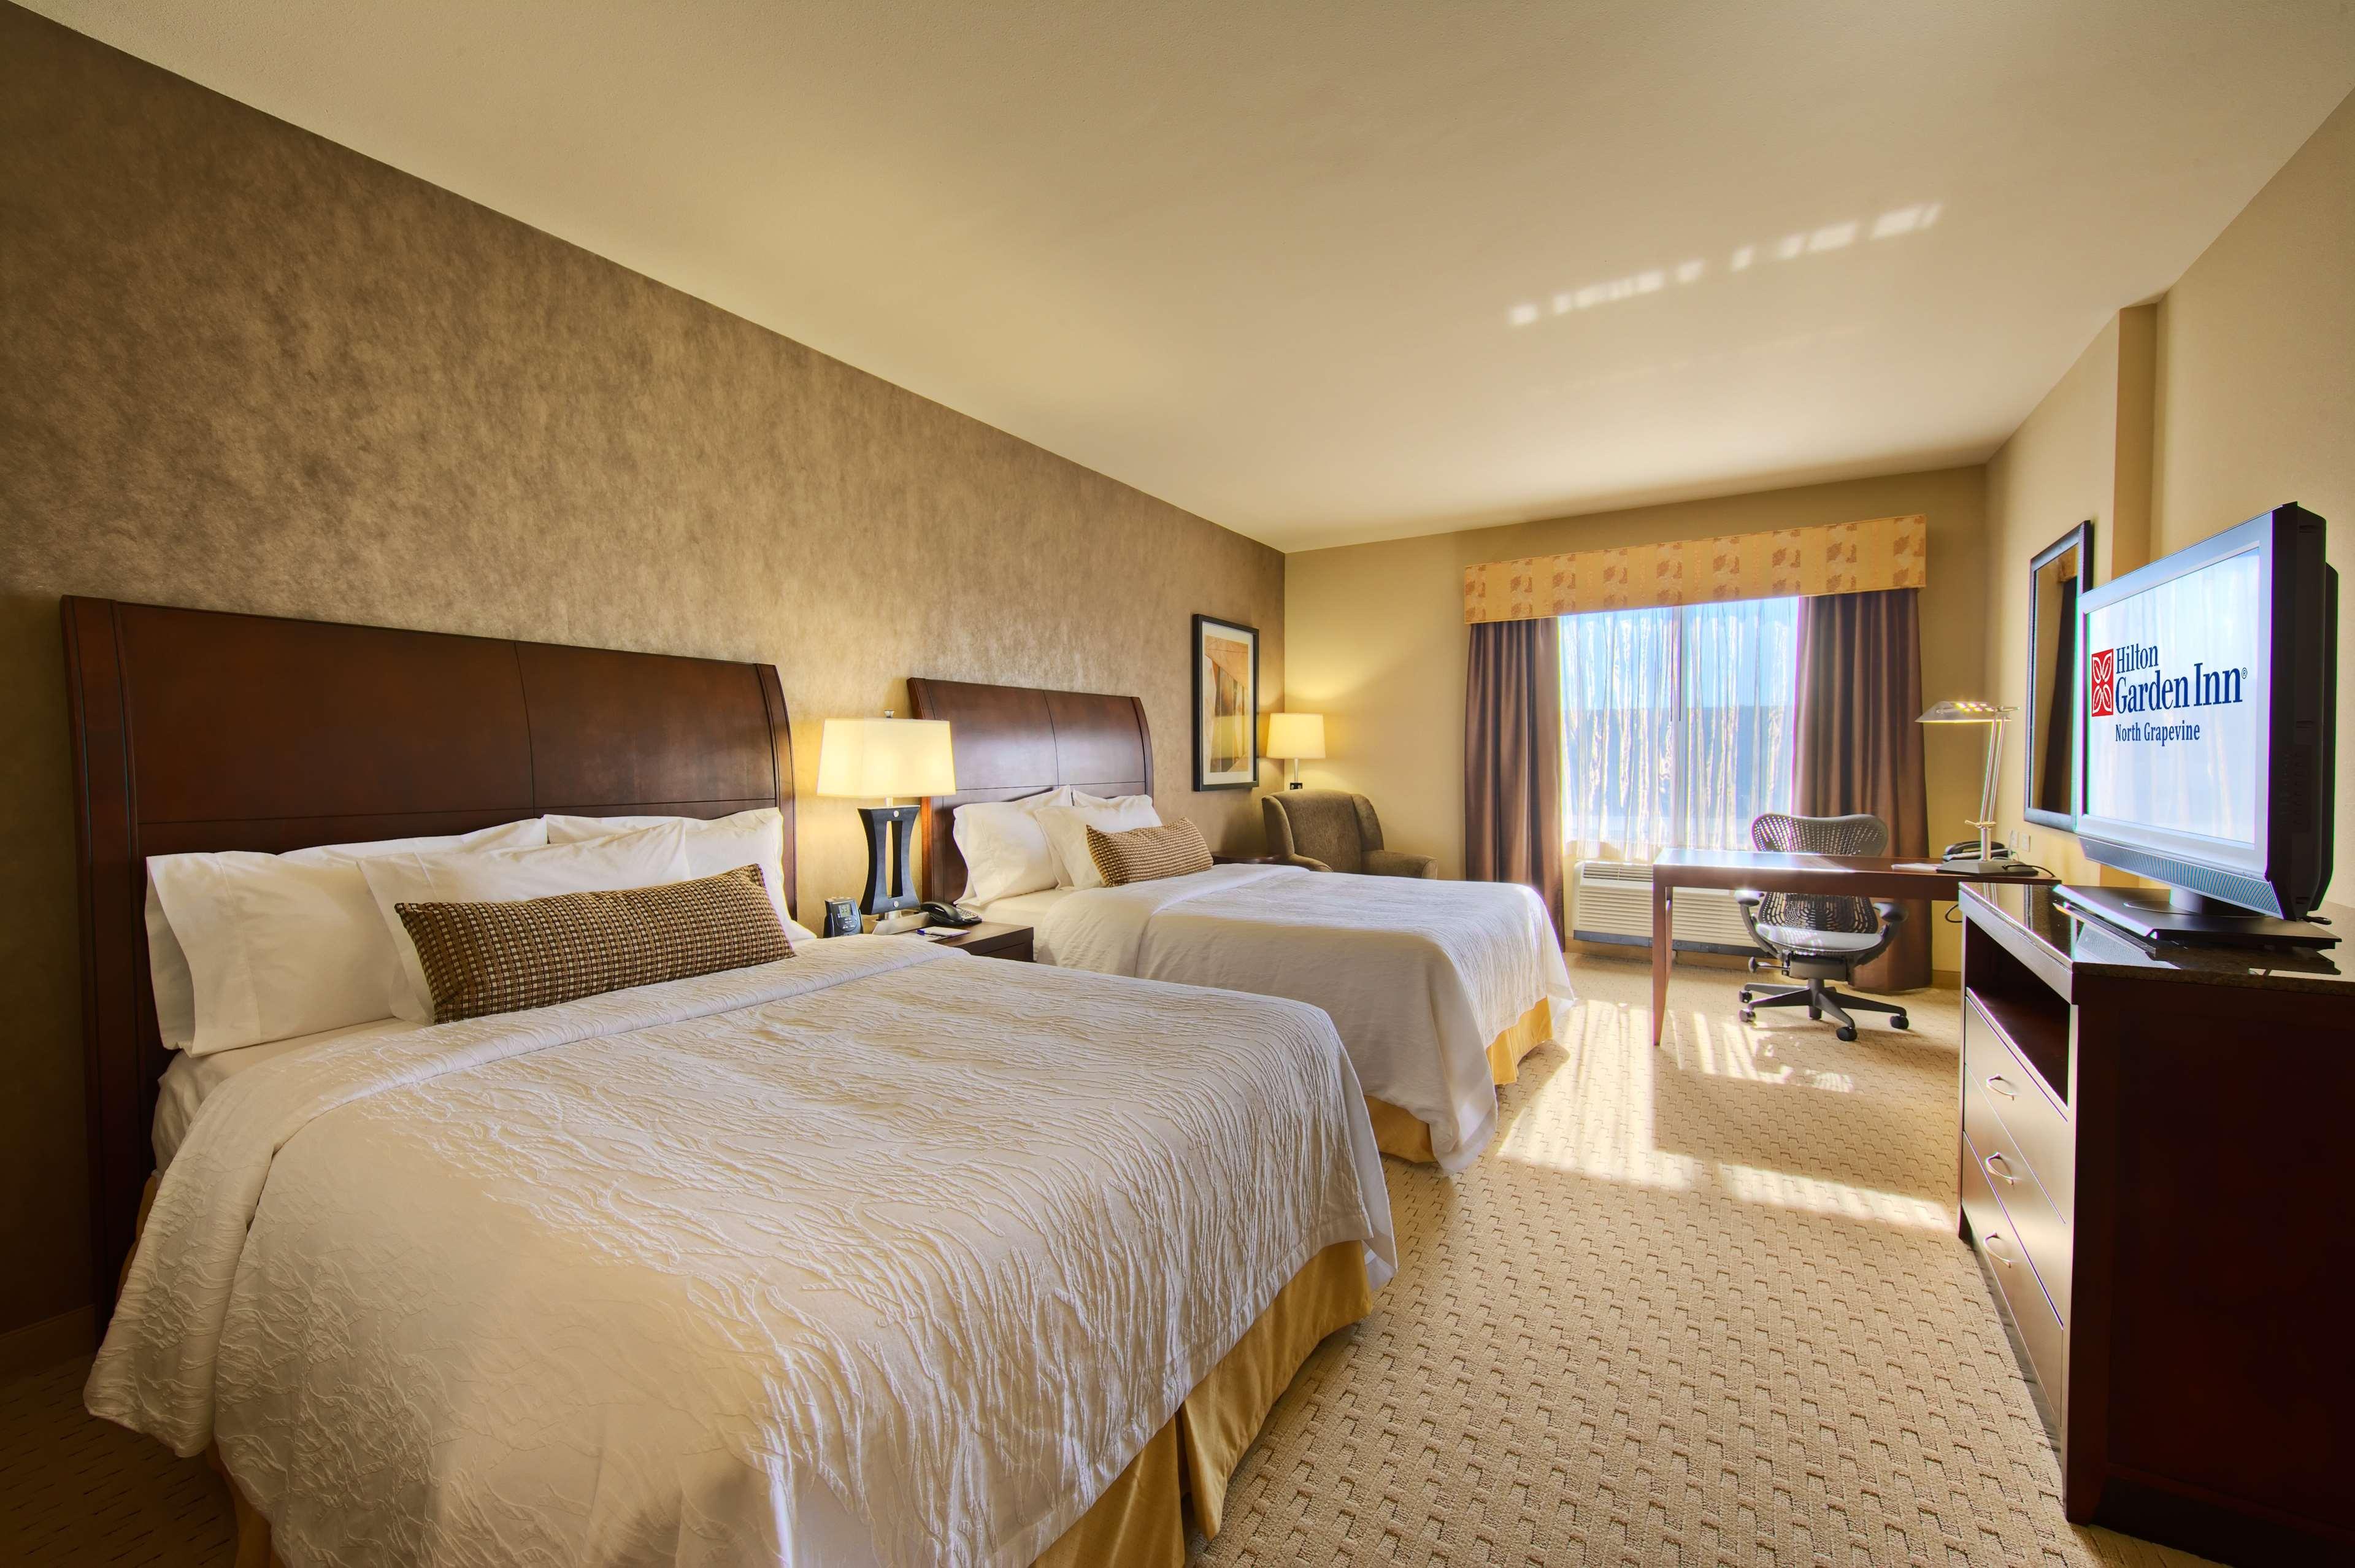 Hilton Garden Inn DFW North Grapevine image 24